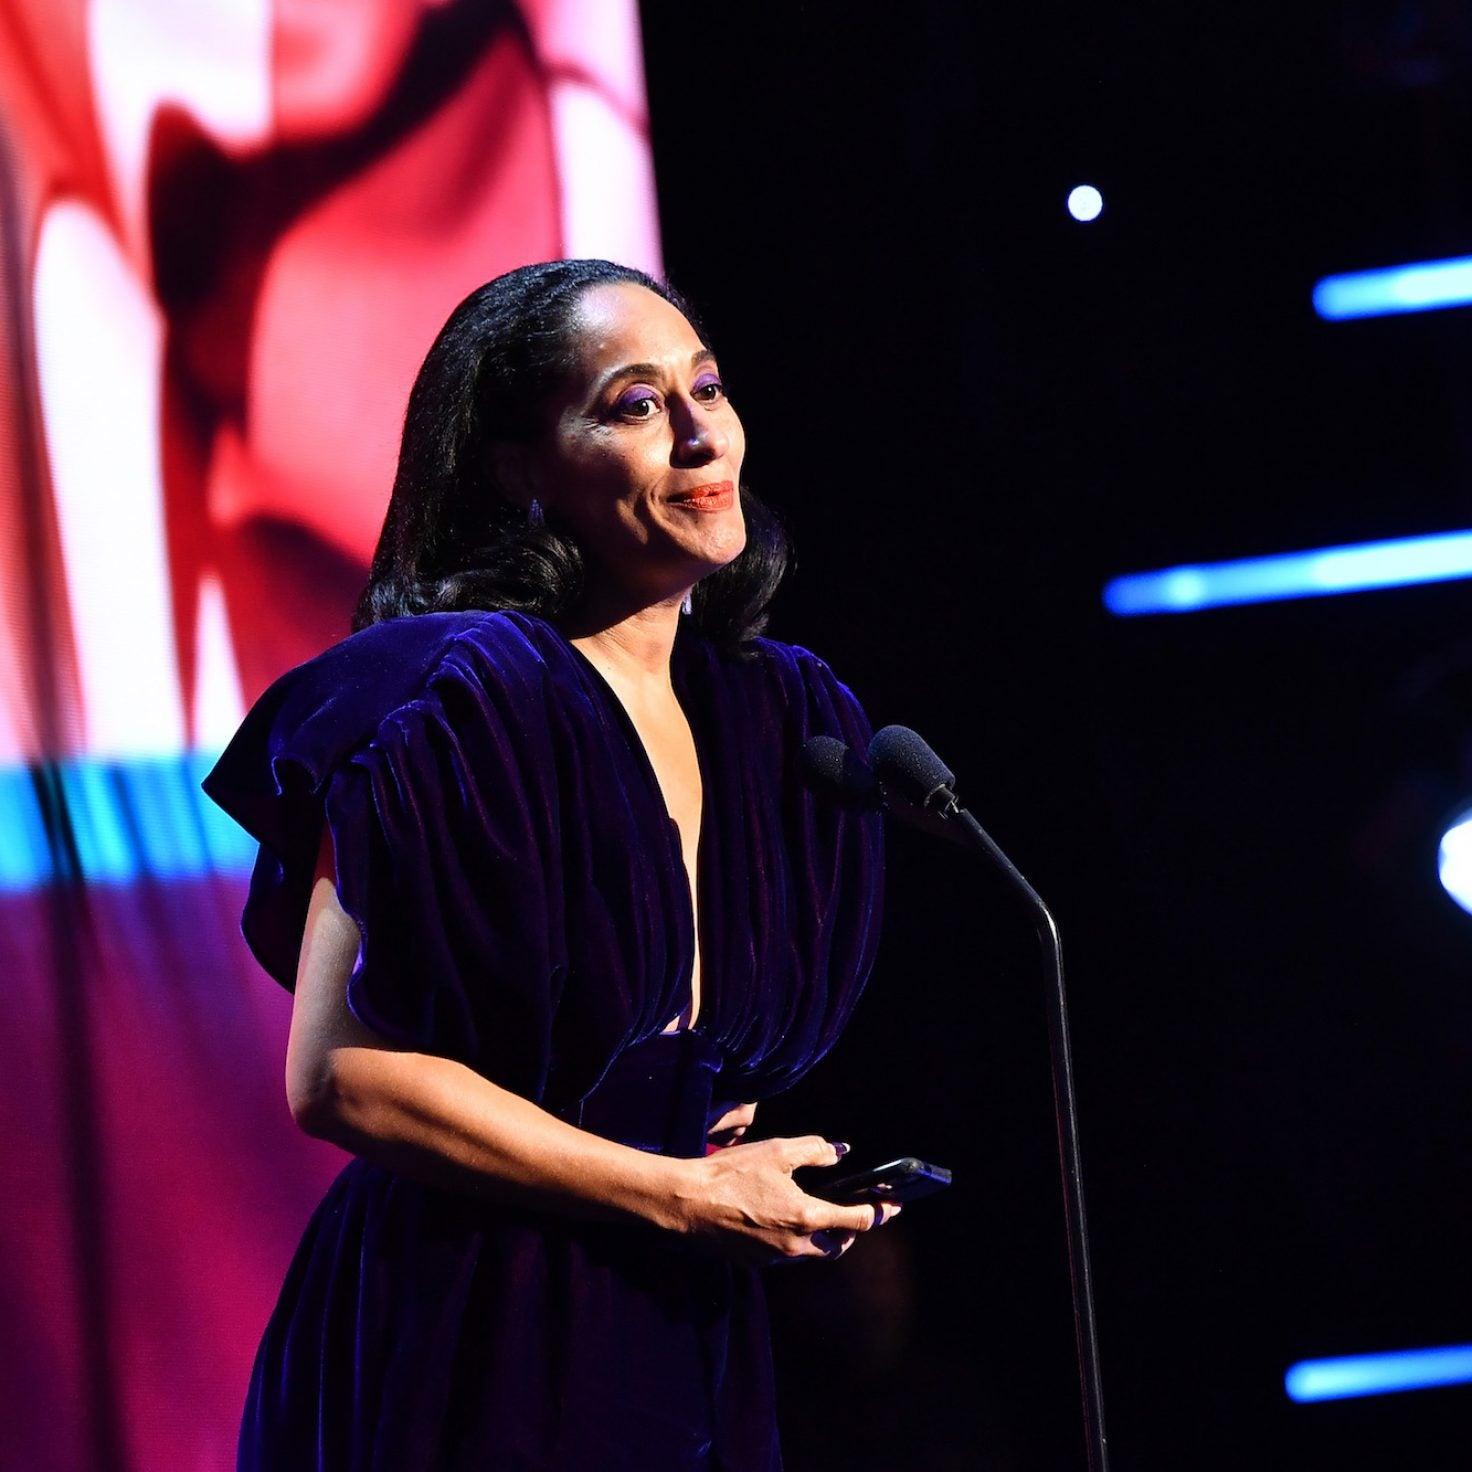 Tracee Ellis Ross Celebrates Powerful Women In NAACP Image Awards Speech